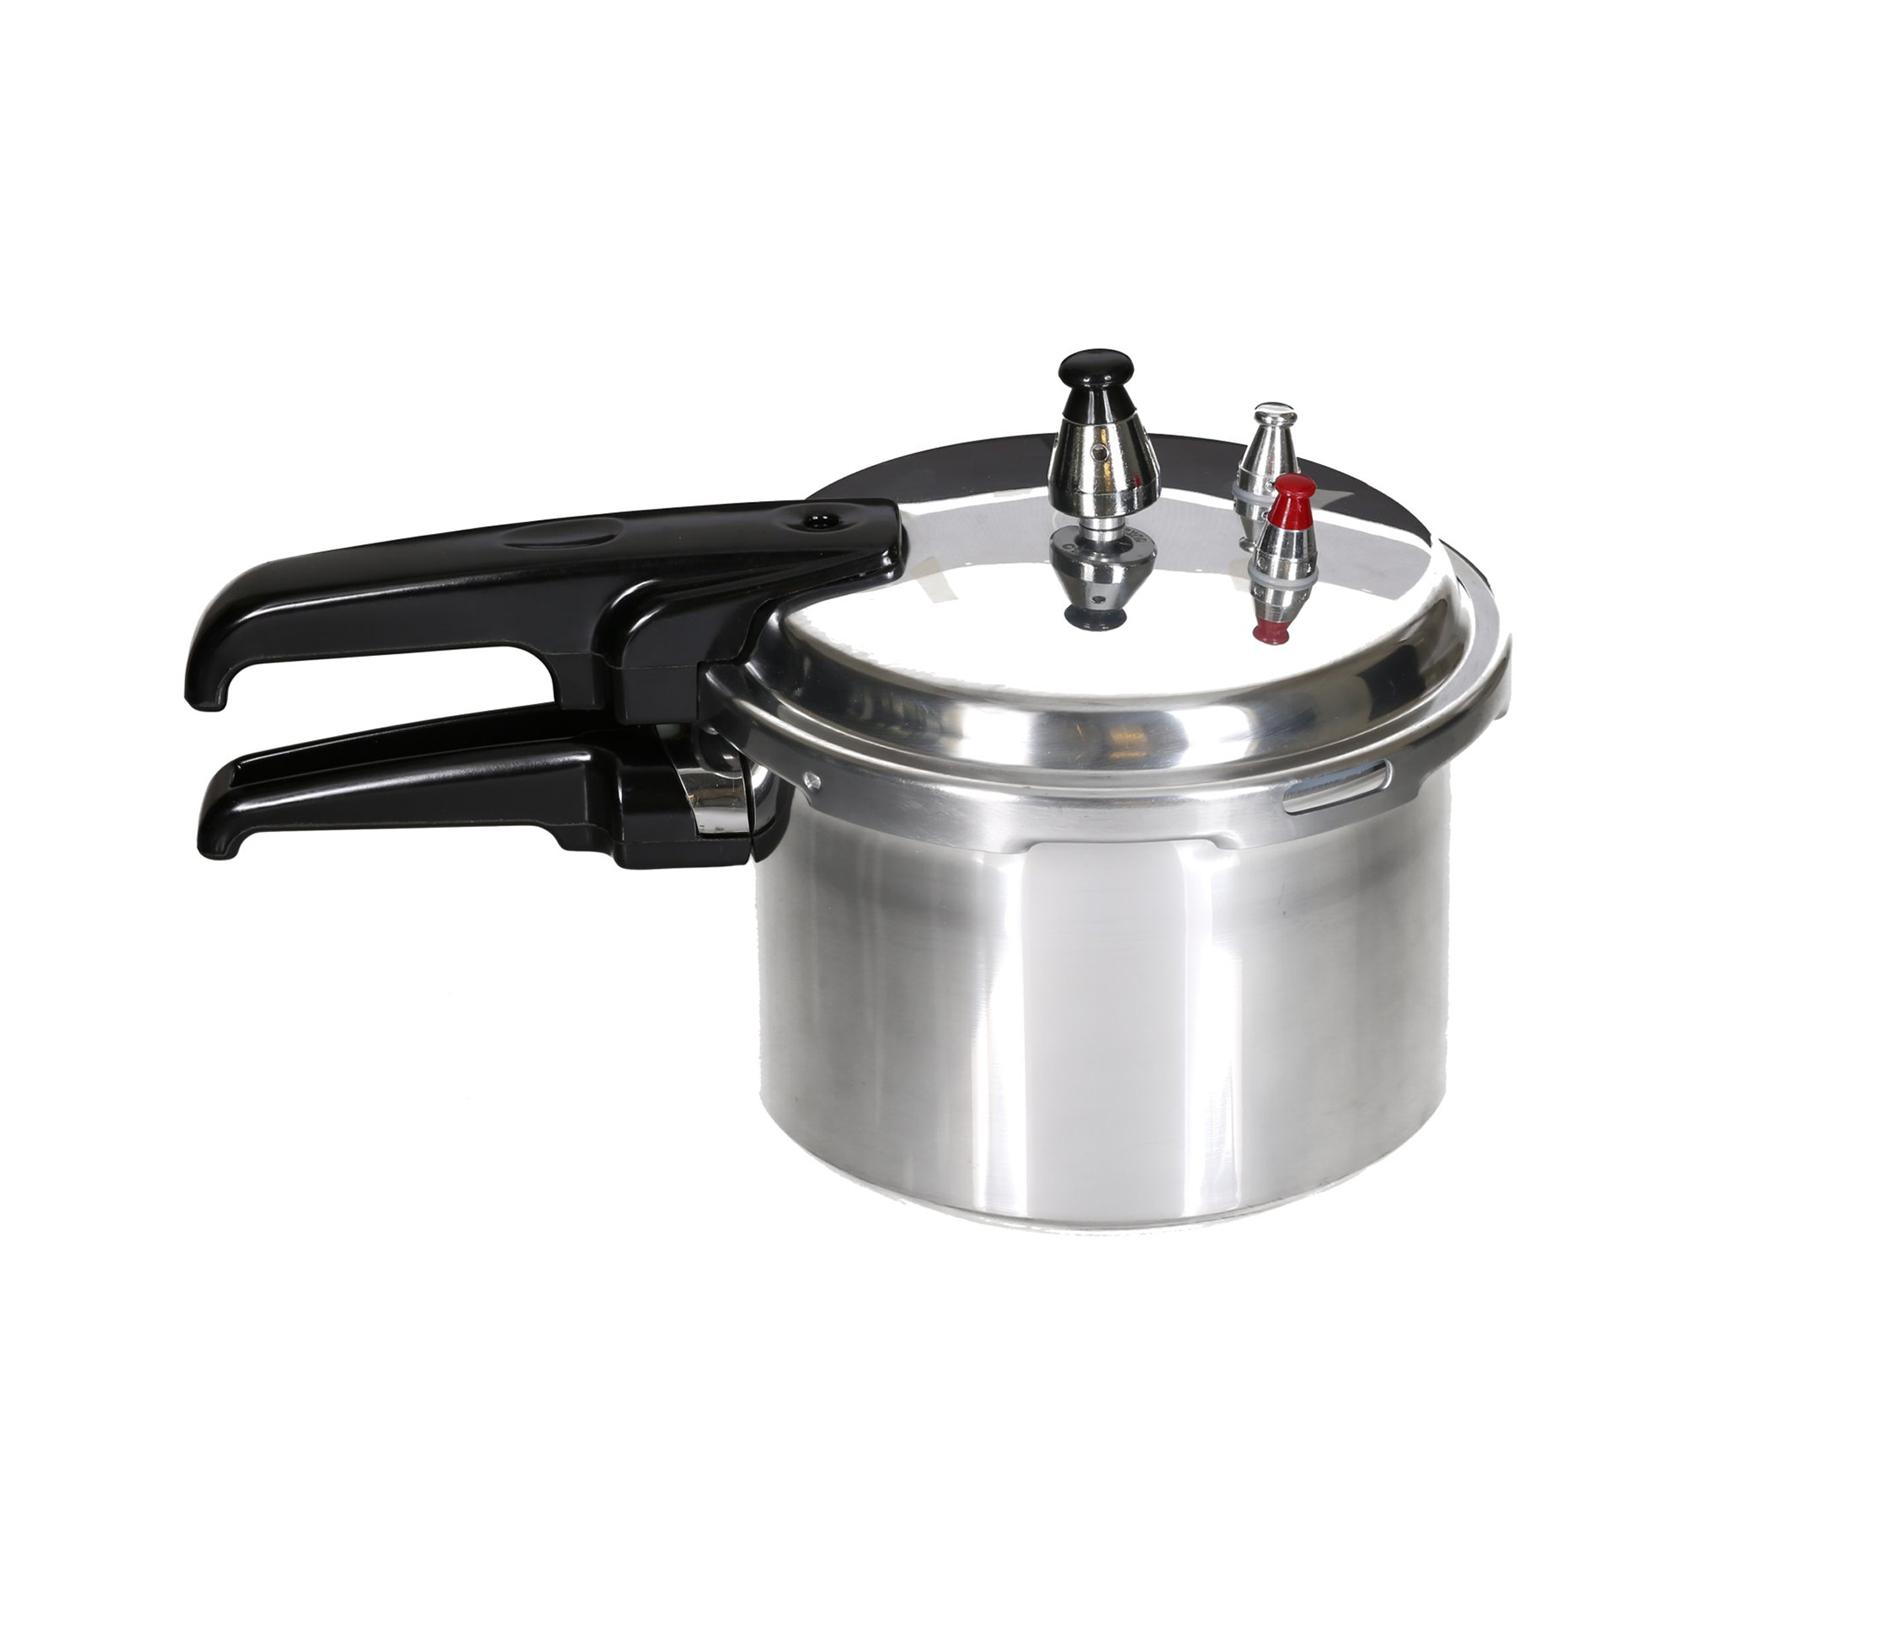 Aluminium Schnellkochtopf Bergner Kochtopf Dampfkocher Schnellkocher poliert